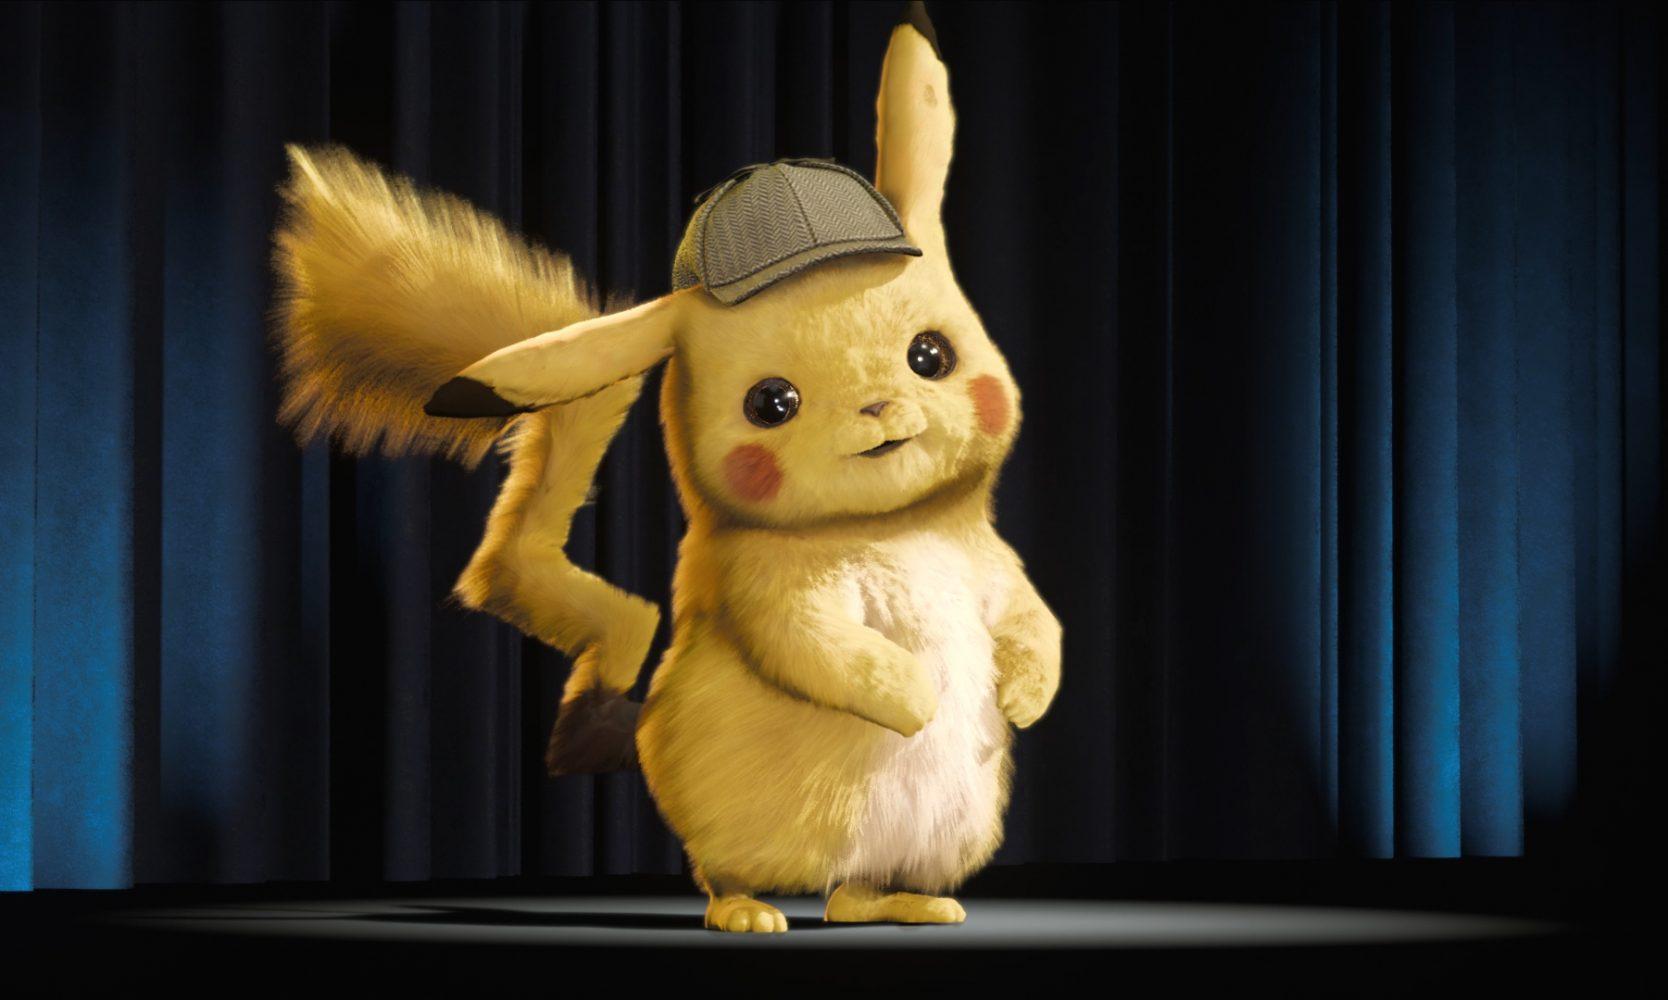 Pikachu Realtime 2